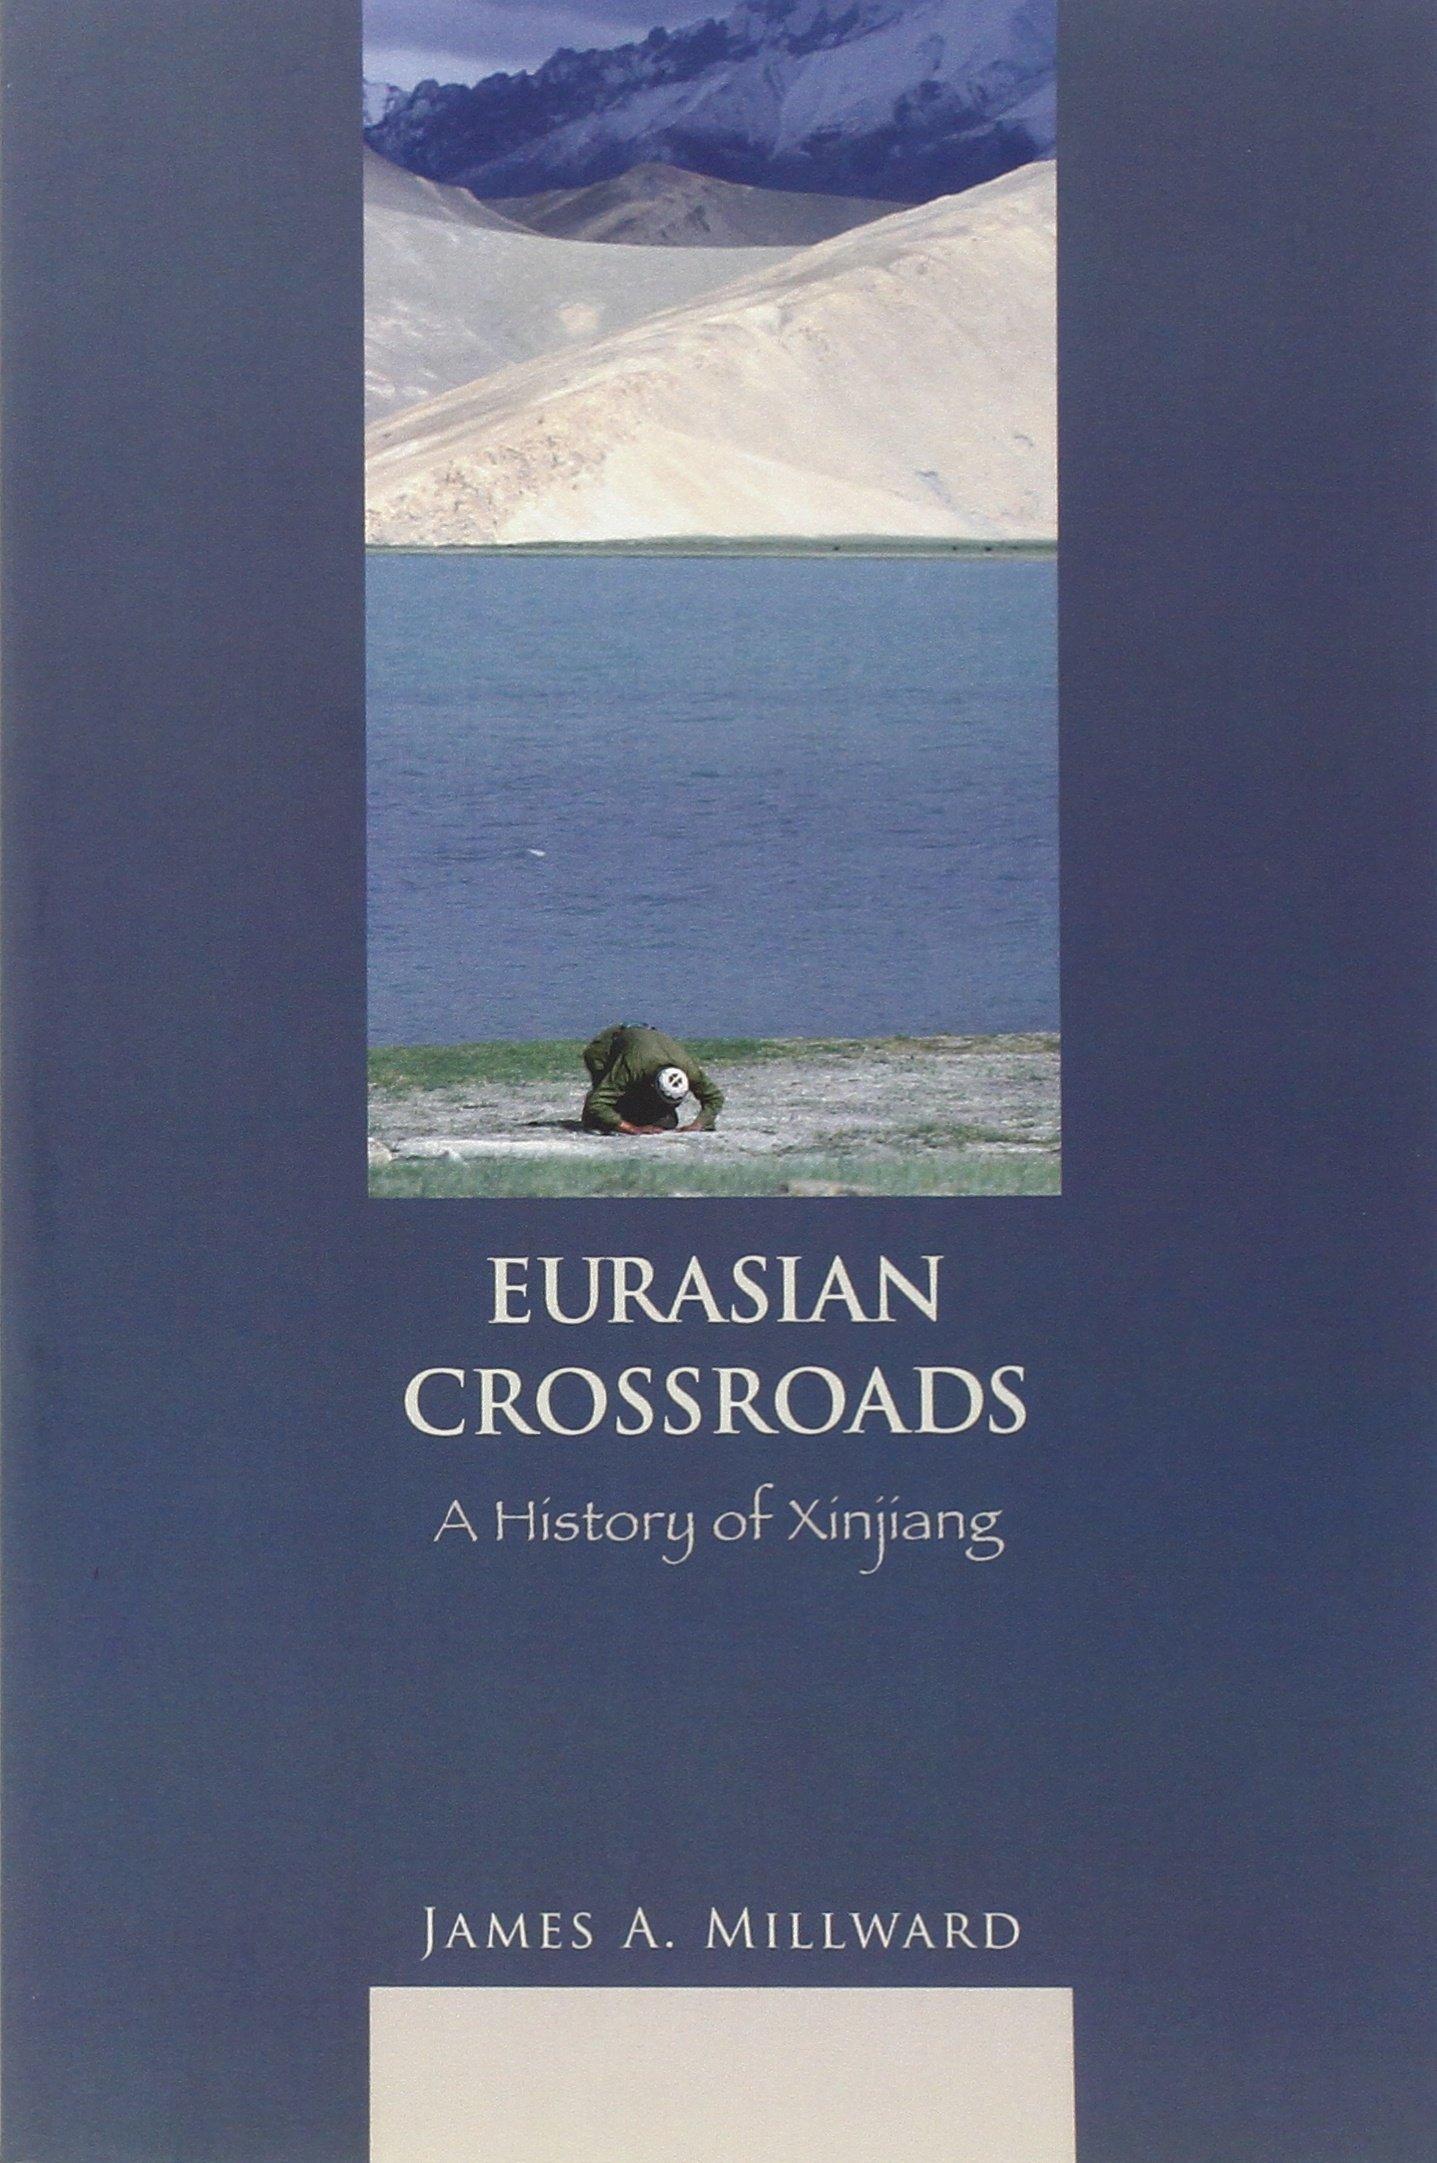 Eurasian Crossroads: A History of Xinjiang Paperback – 20 Oct 2017